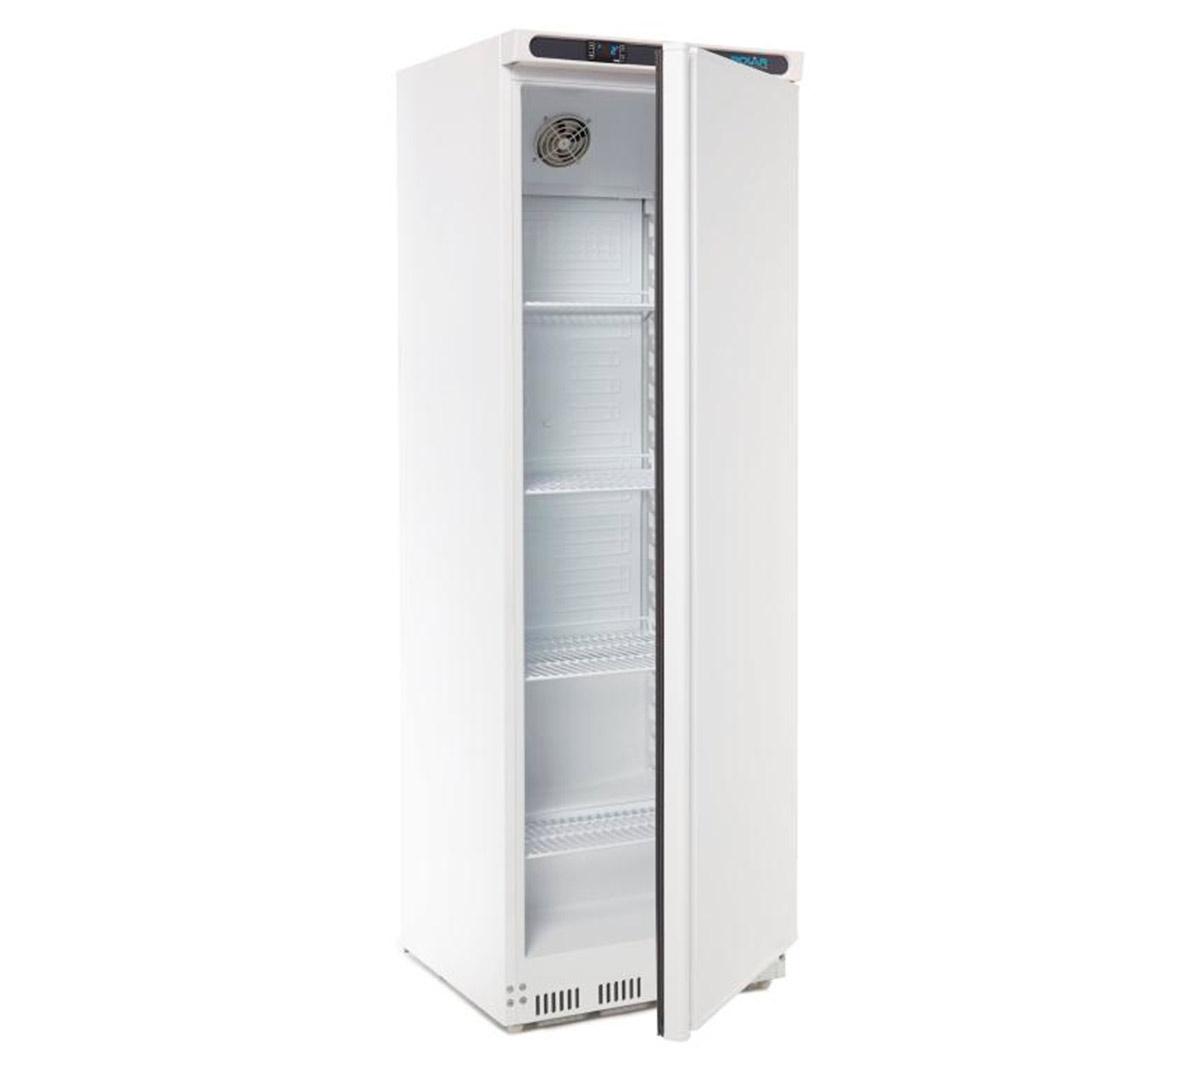 nevera profesional, nevera, frigorífico, frigorífico profesional.